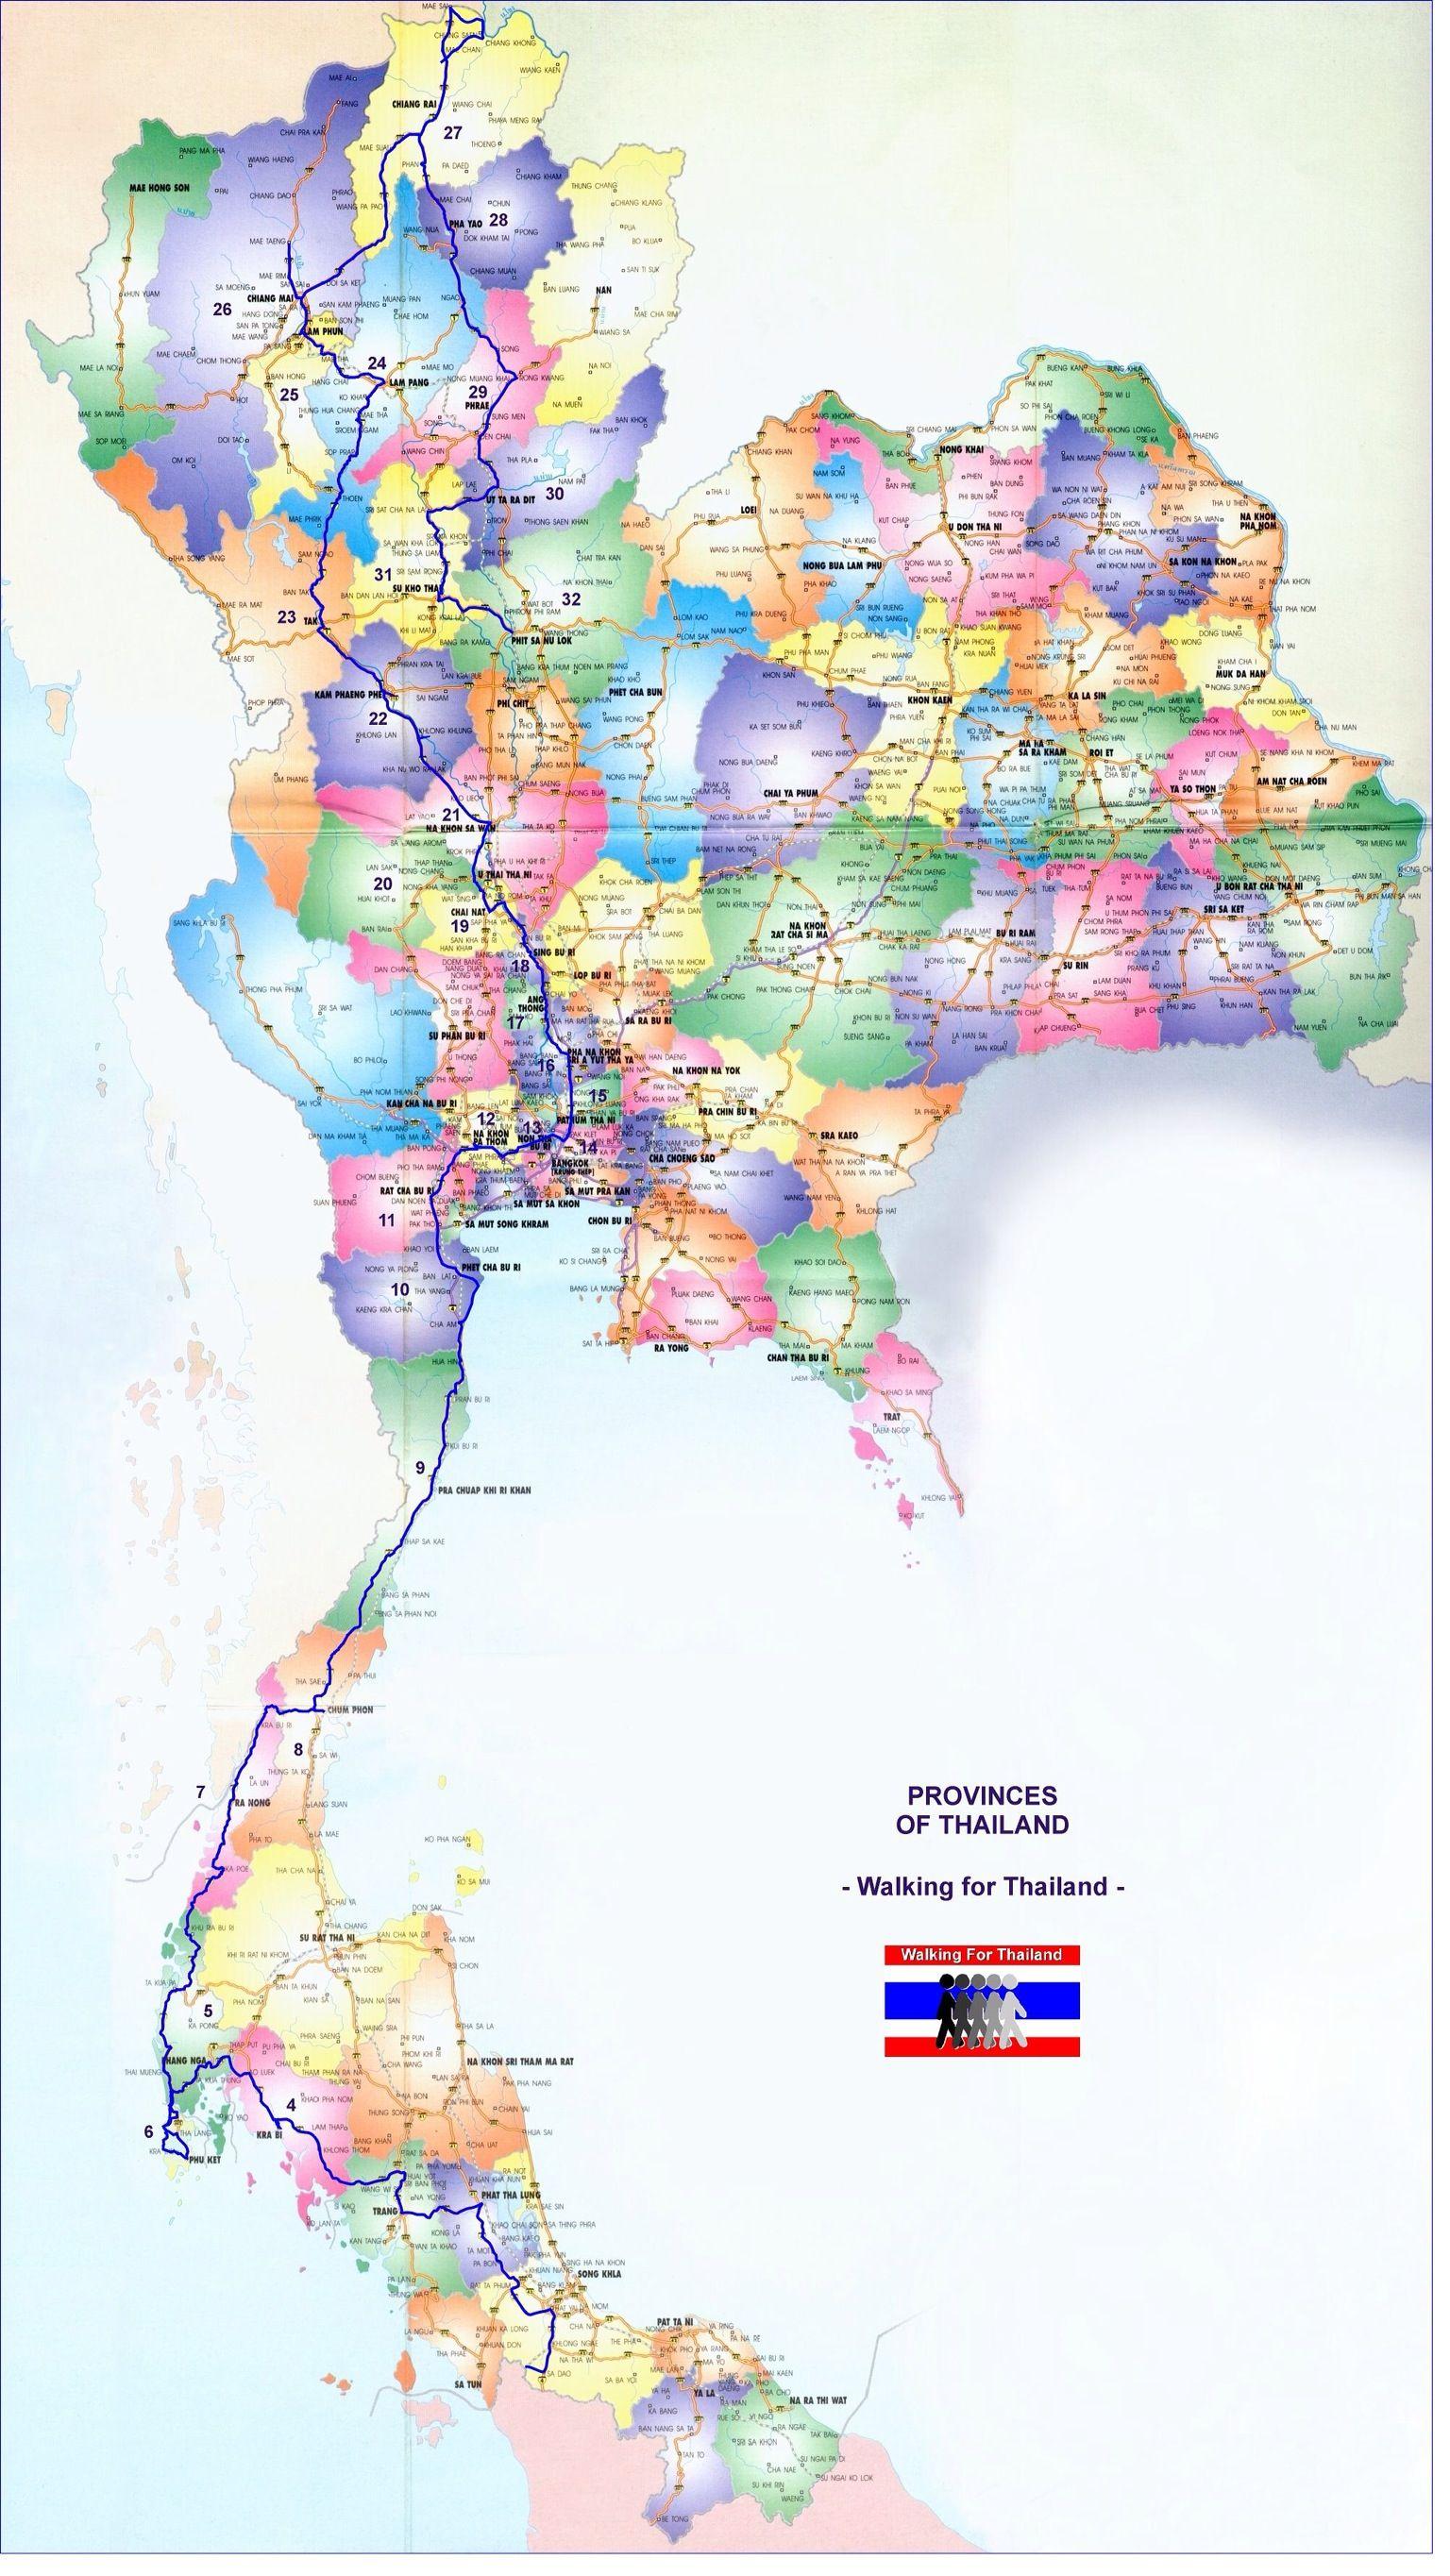 The Provinces Of Thailand ไทย ย นด ต อนร บ